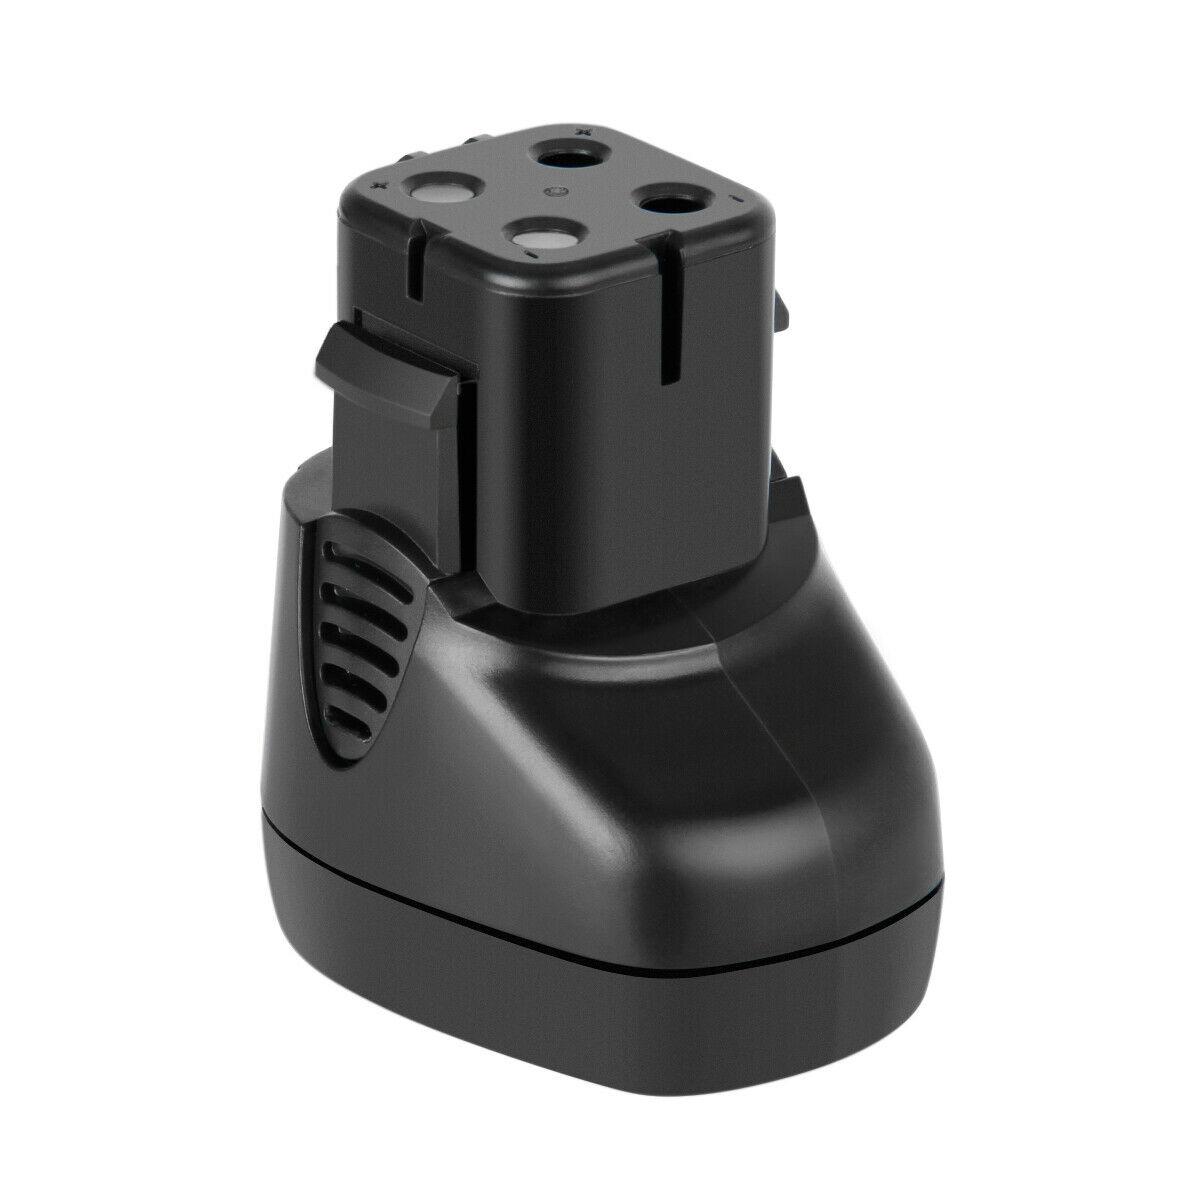 Akku für 3.0AH 7.2V Ni-MH Dremel 757-01 7700-01 7700-02 Cordless Multi-Tool(Ersatz)